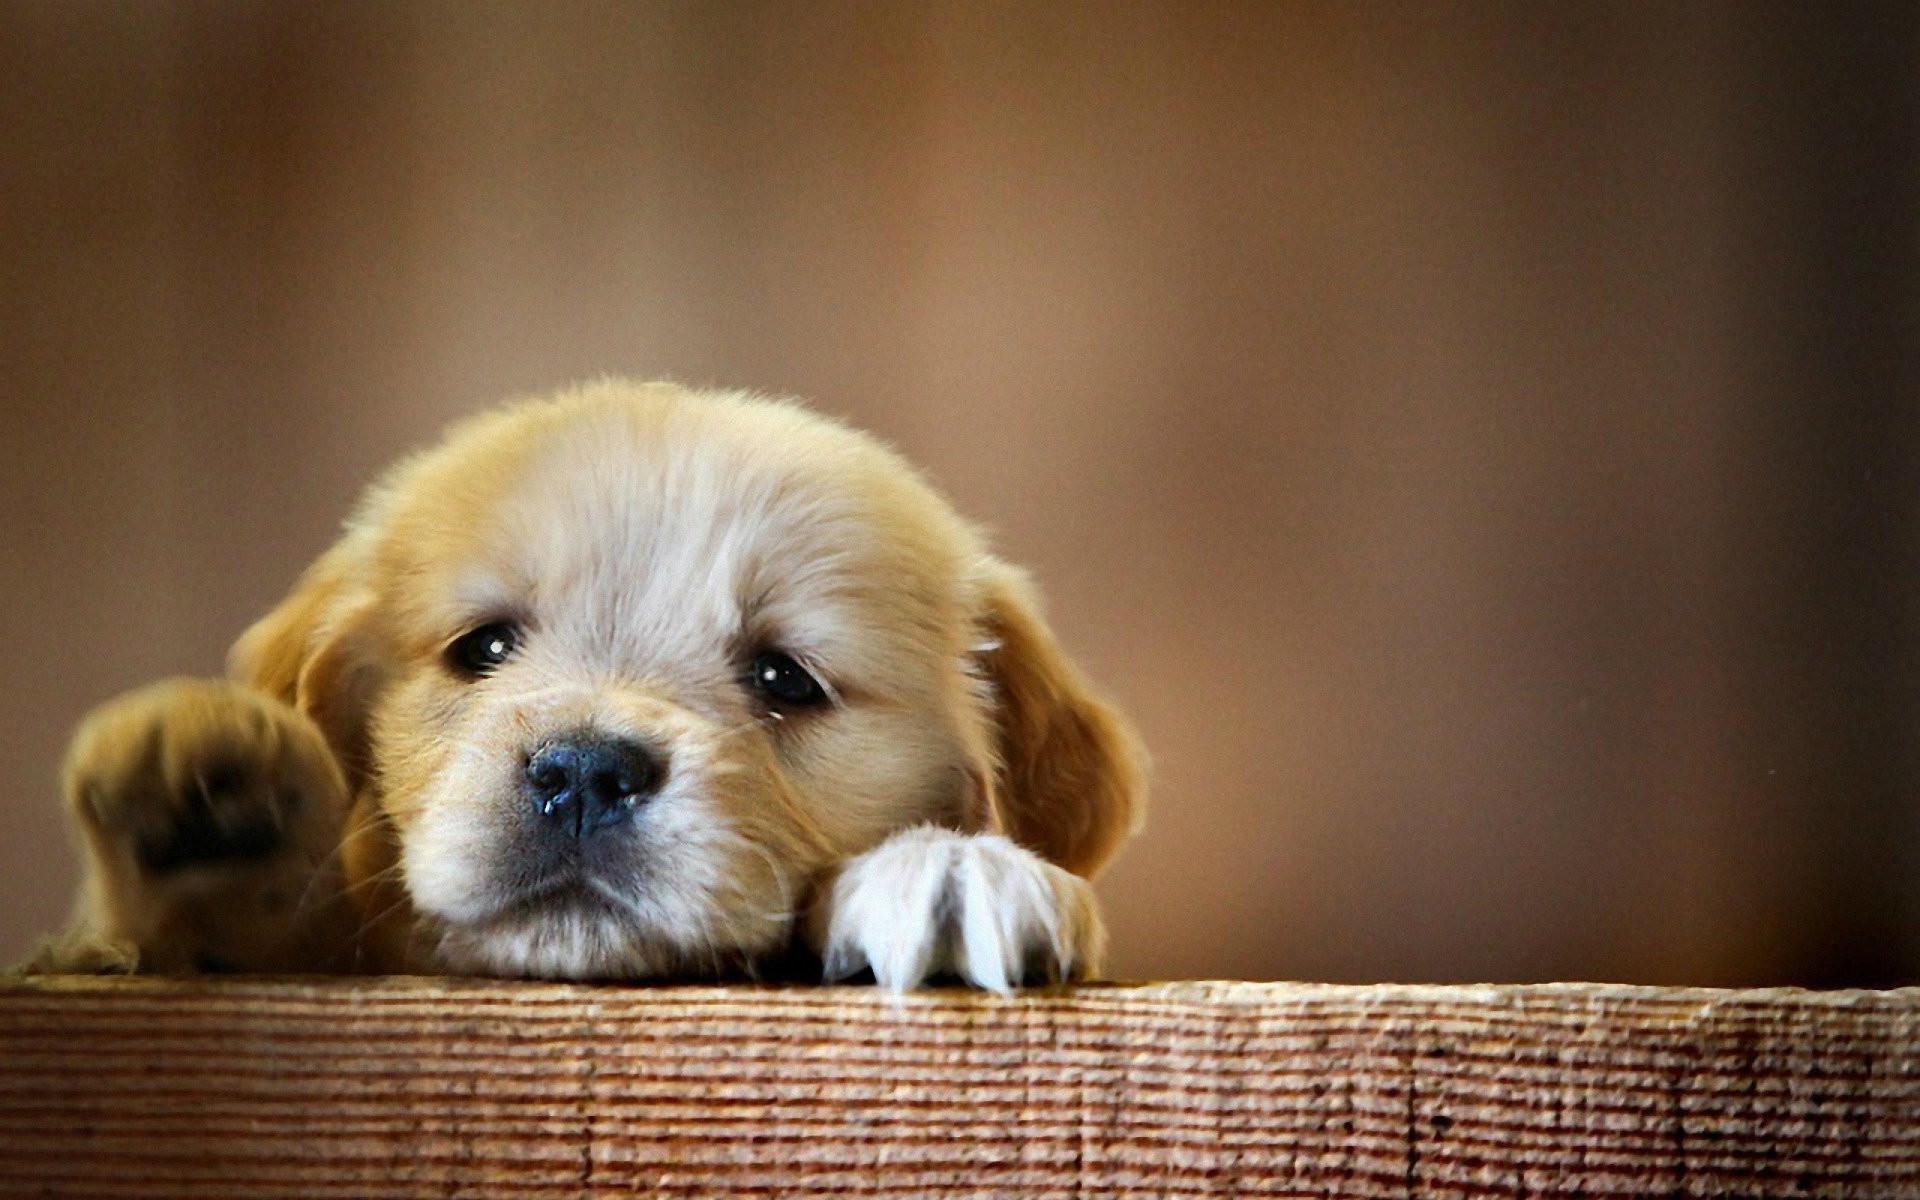 Cute baby dog wallpaper – photo#4